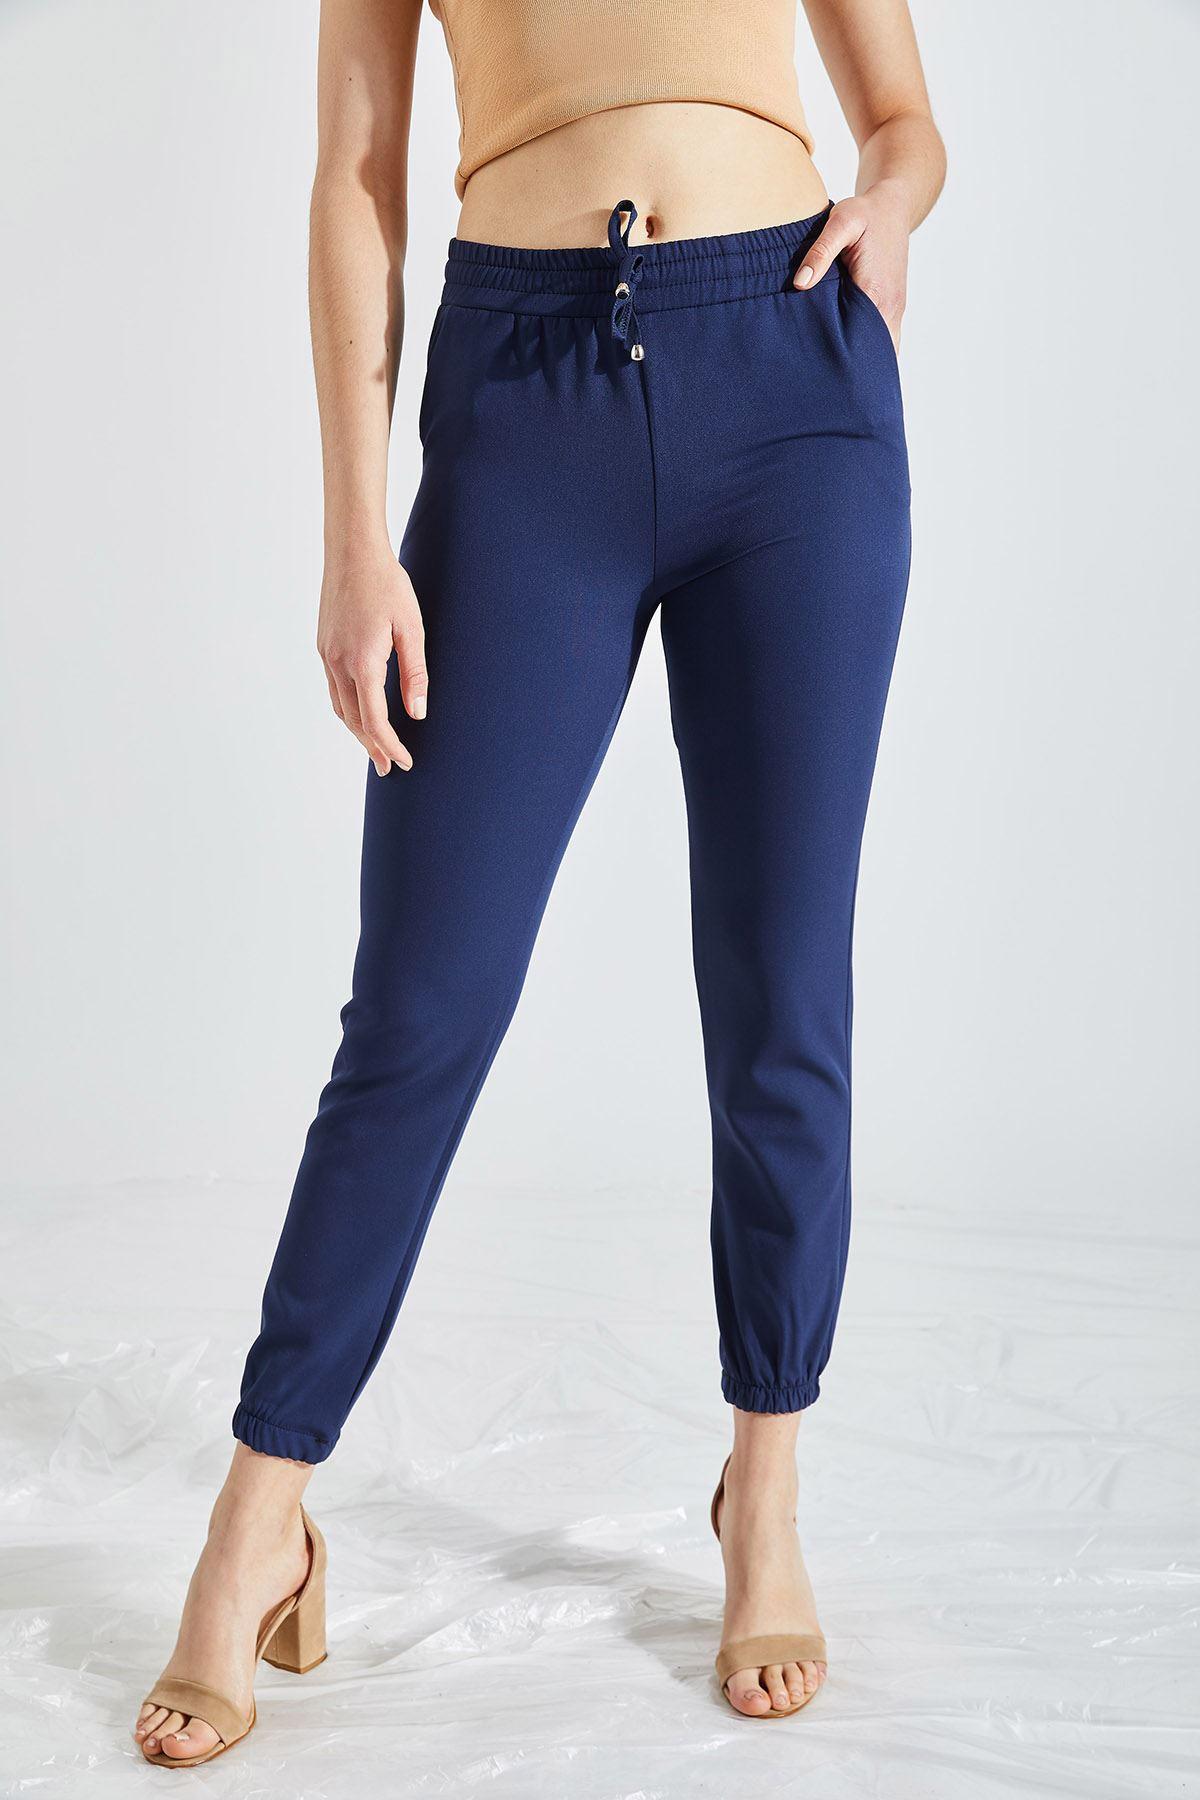 Kadın Bel Ve Paça Lastikli Lacivert Kumaş Pantolon